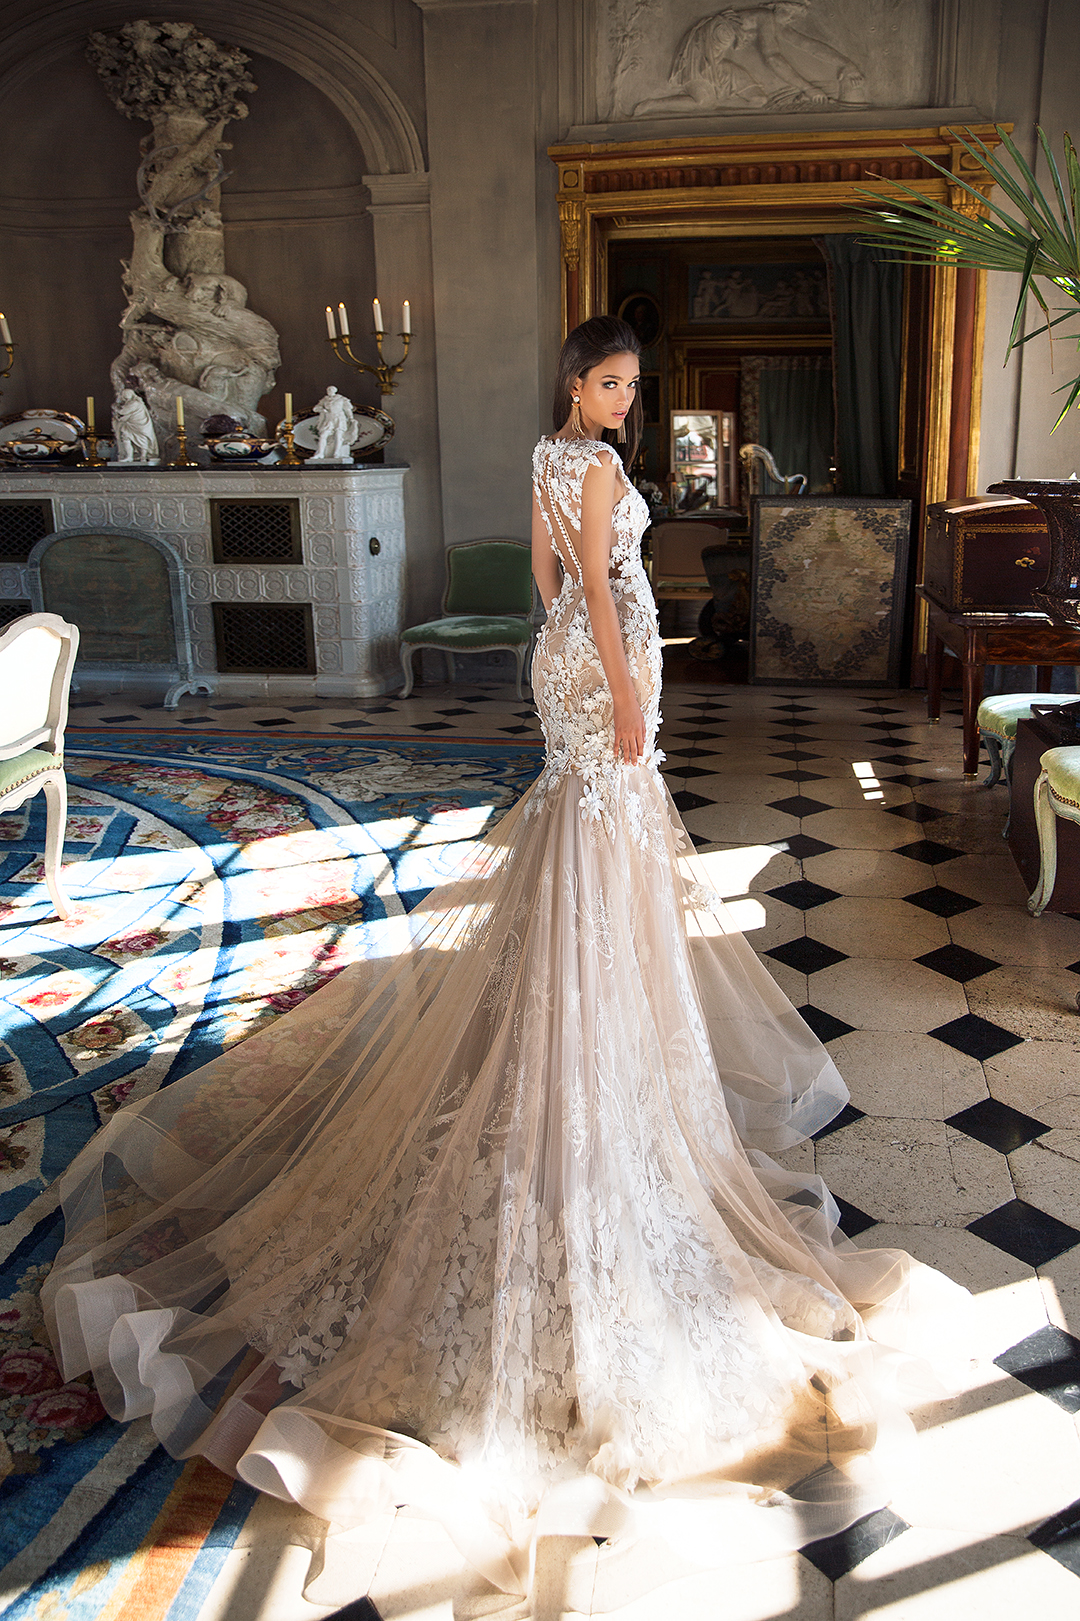 Aora with capeillusion-bridal-wedding-wedding gown-woodbridge-vaughan-mississauga-toronto-gta-ontario-canada-USA